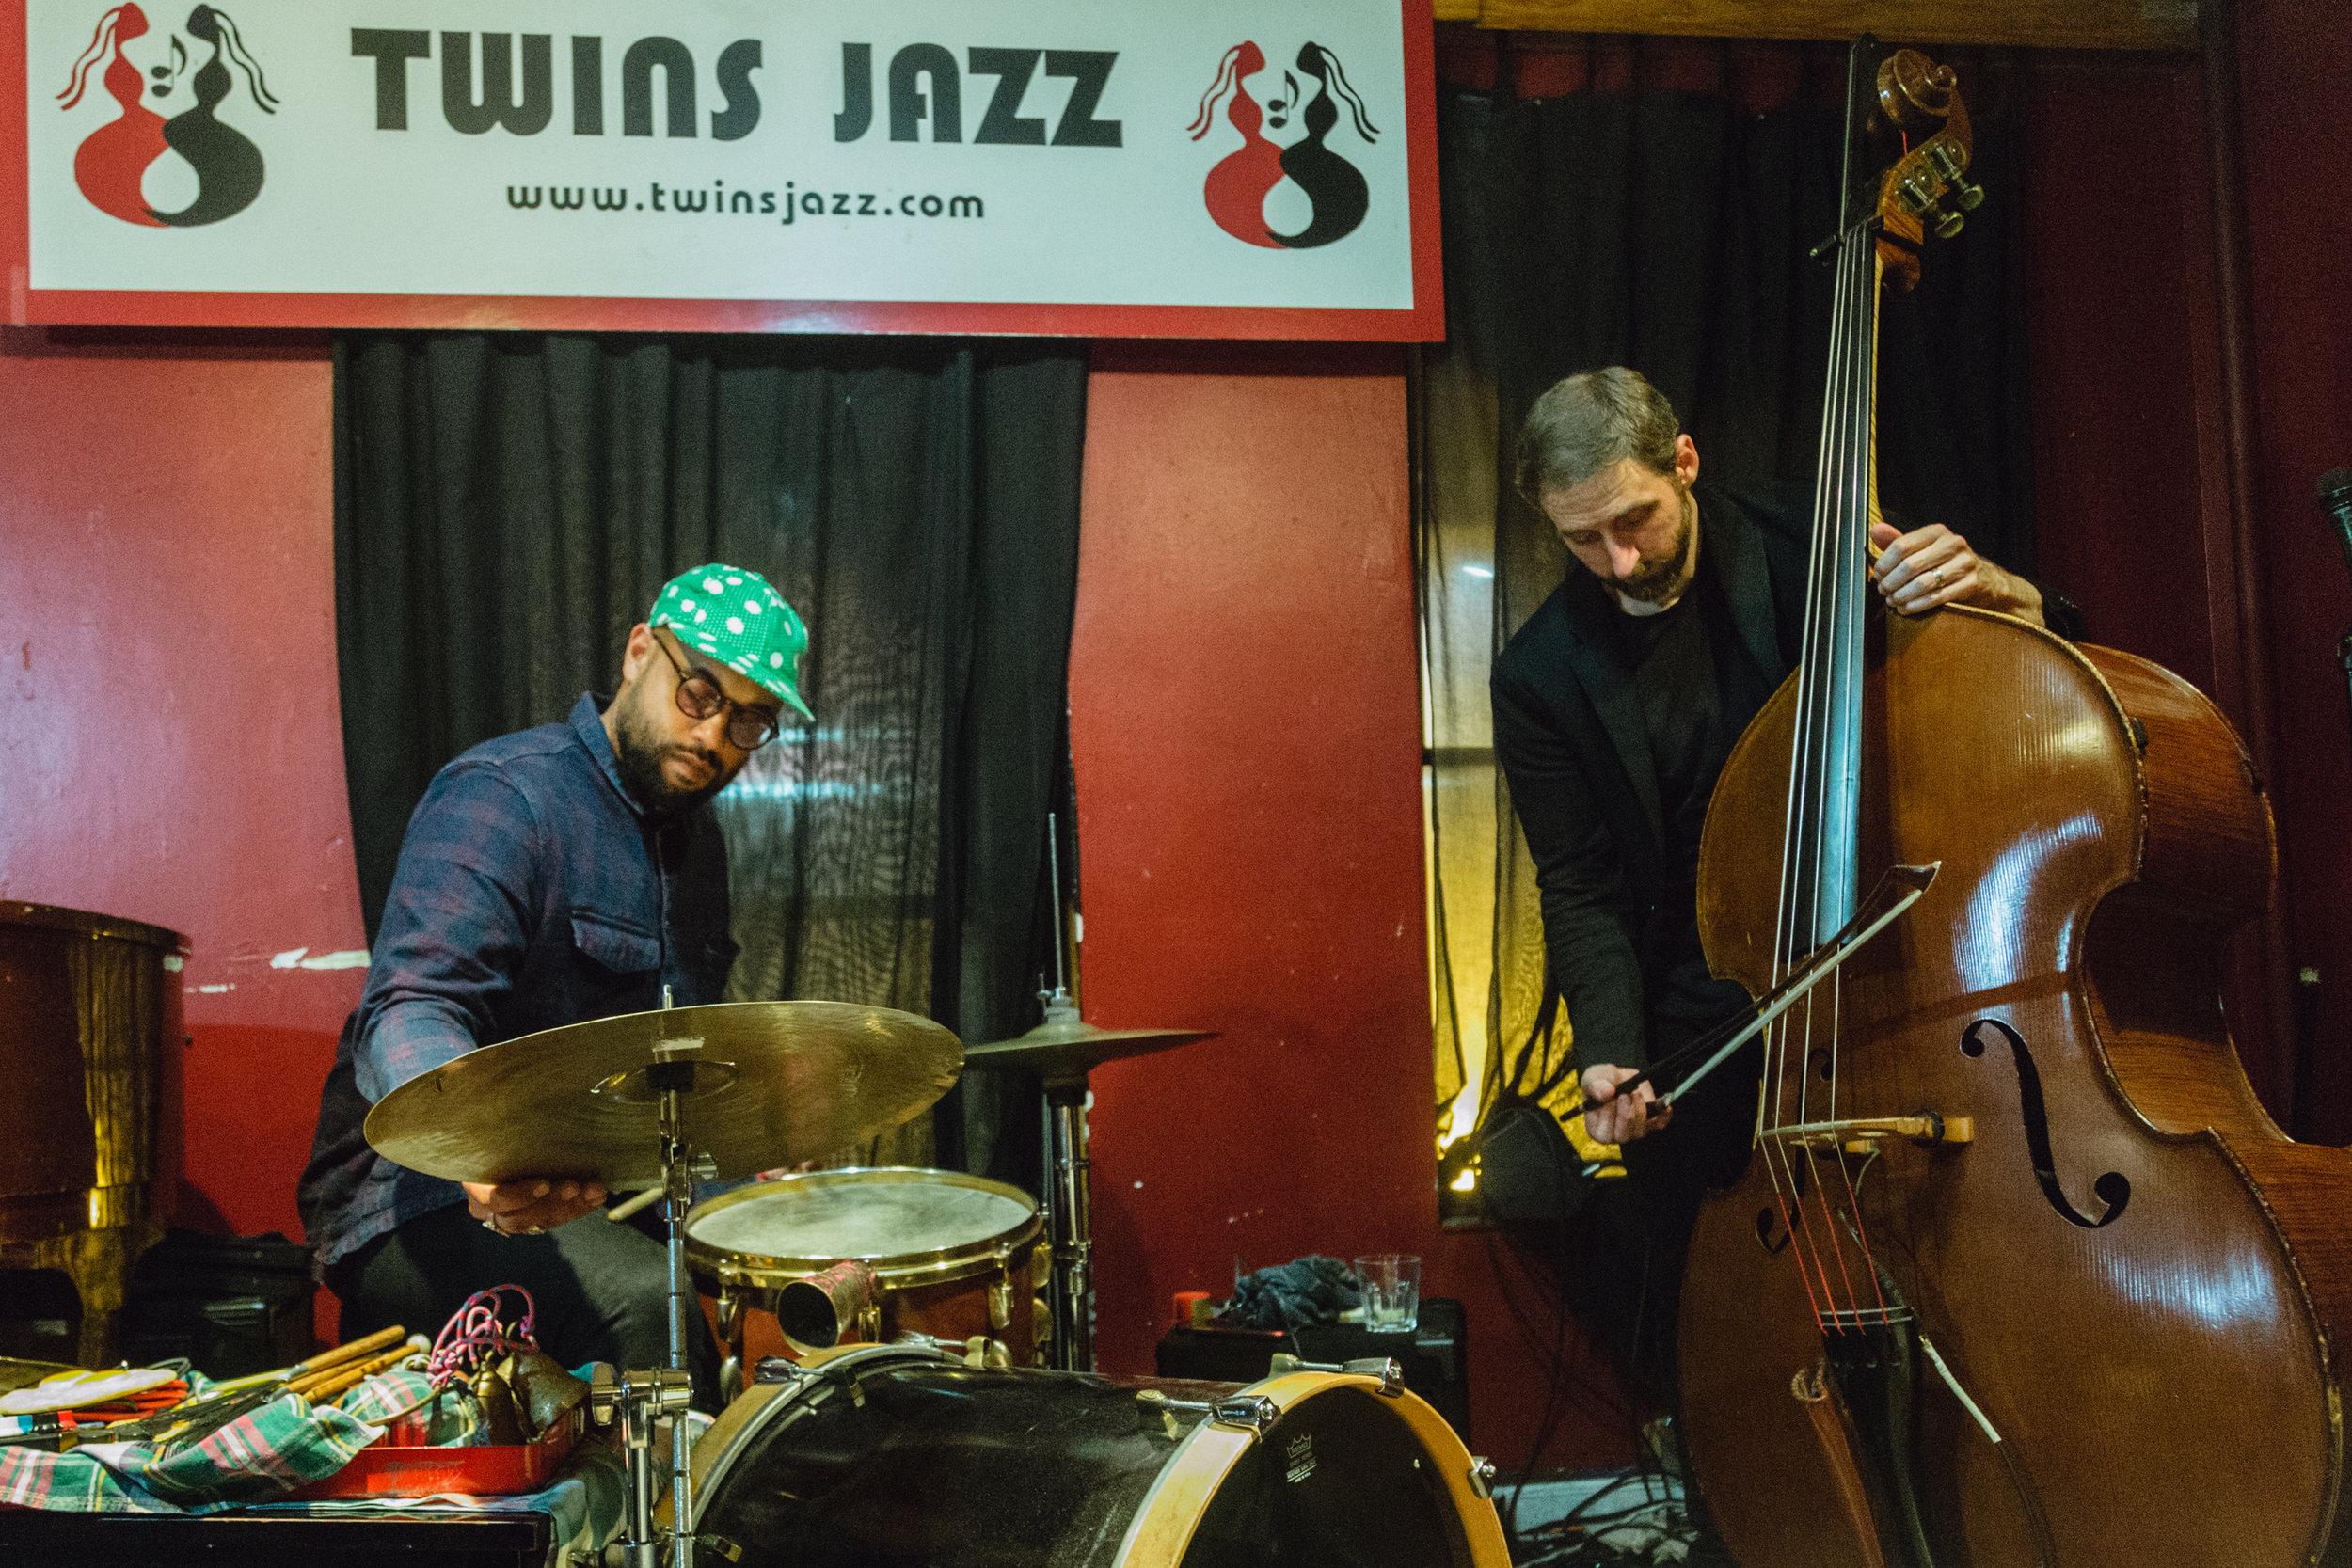 Joe Policastro Trio at Twins Jazz (Photo by Carolina Correa-Caro /  @veronik.bandw )